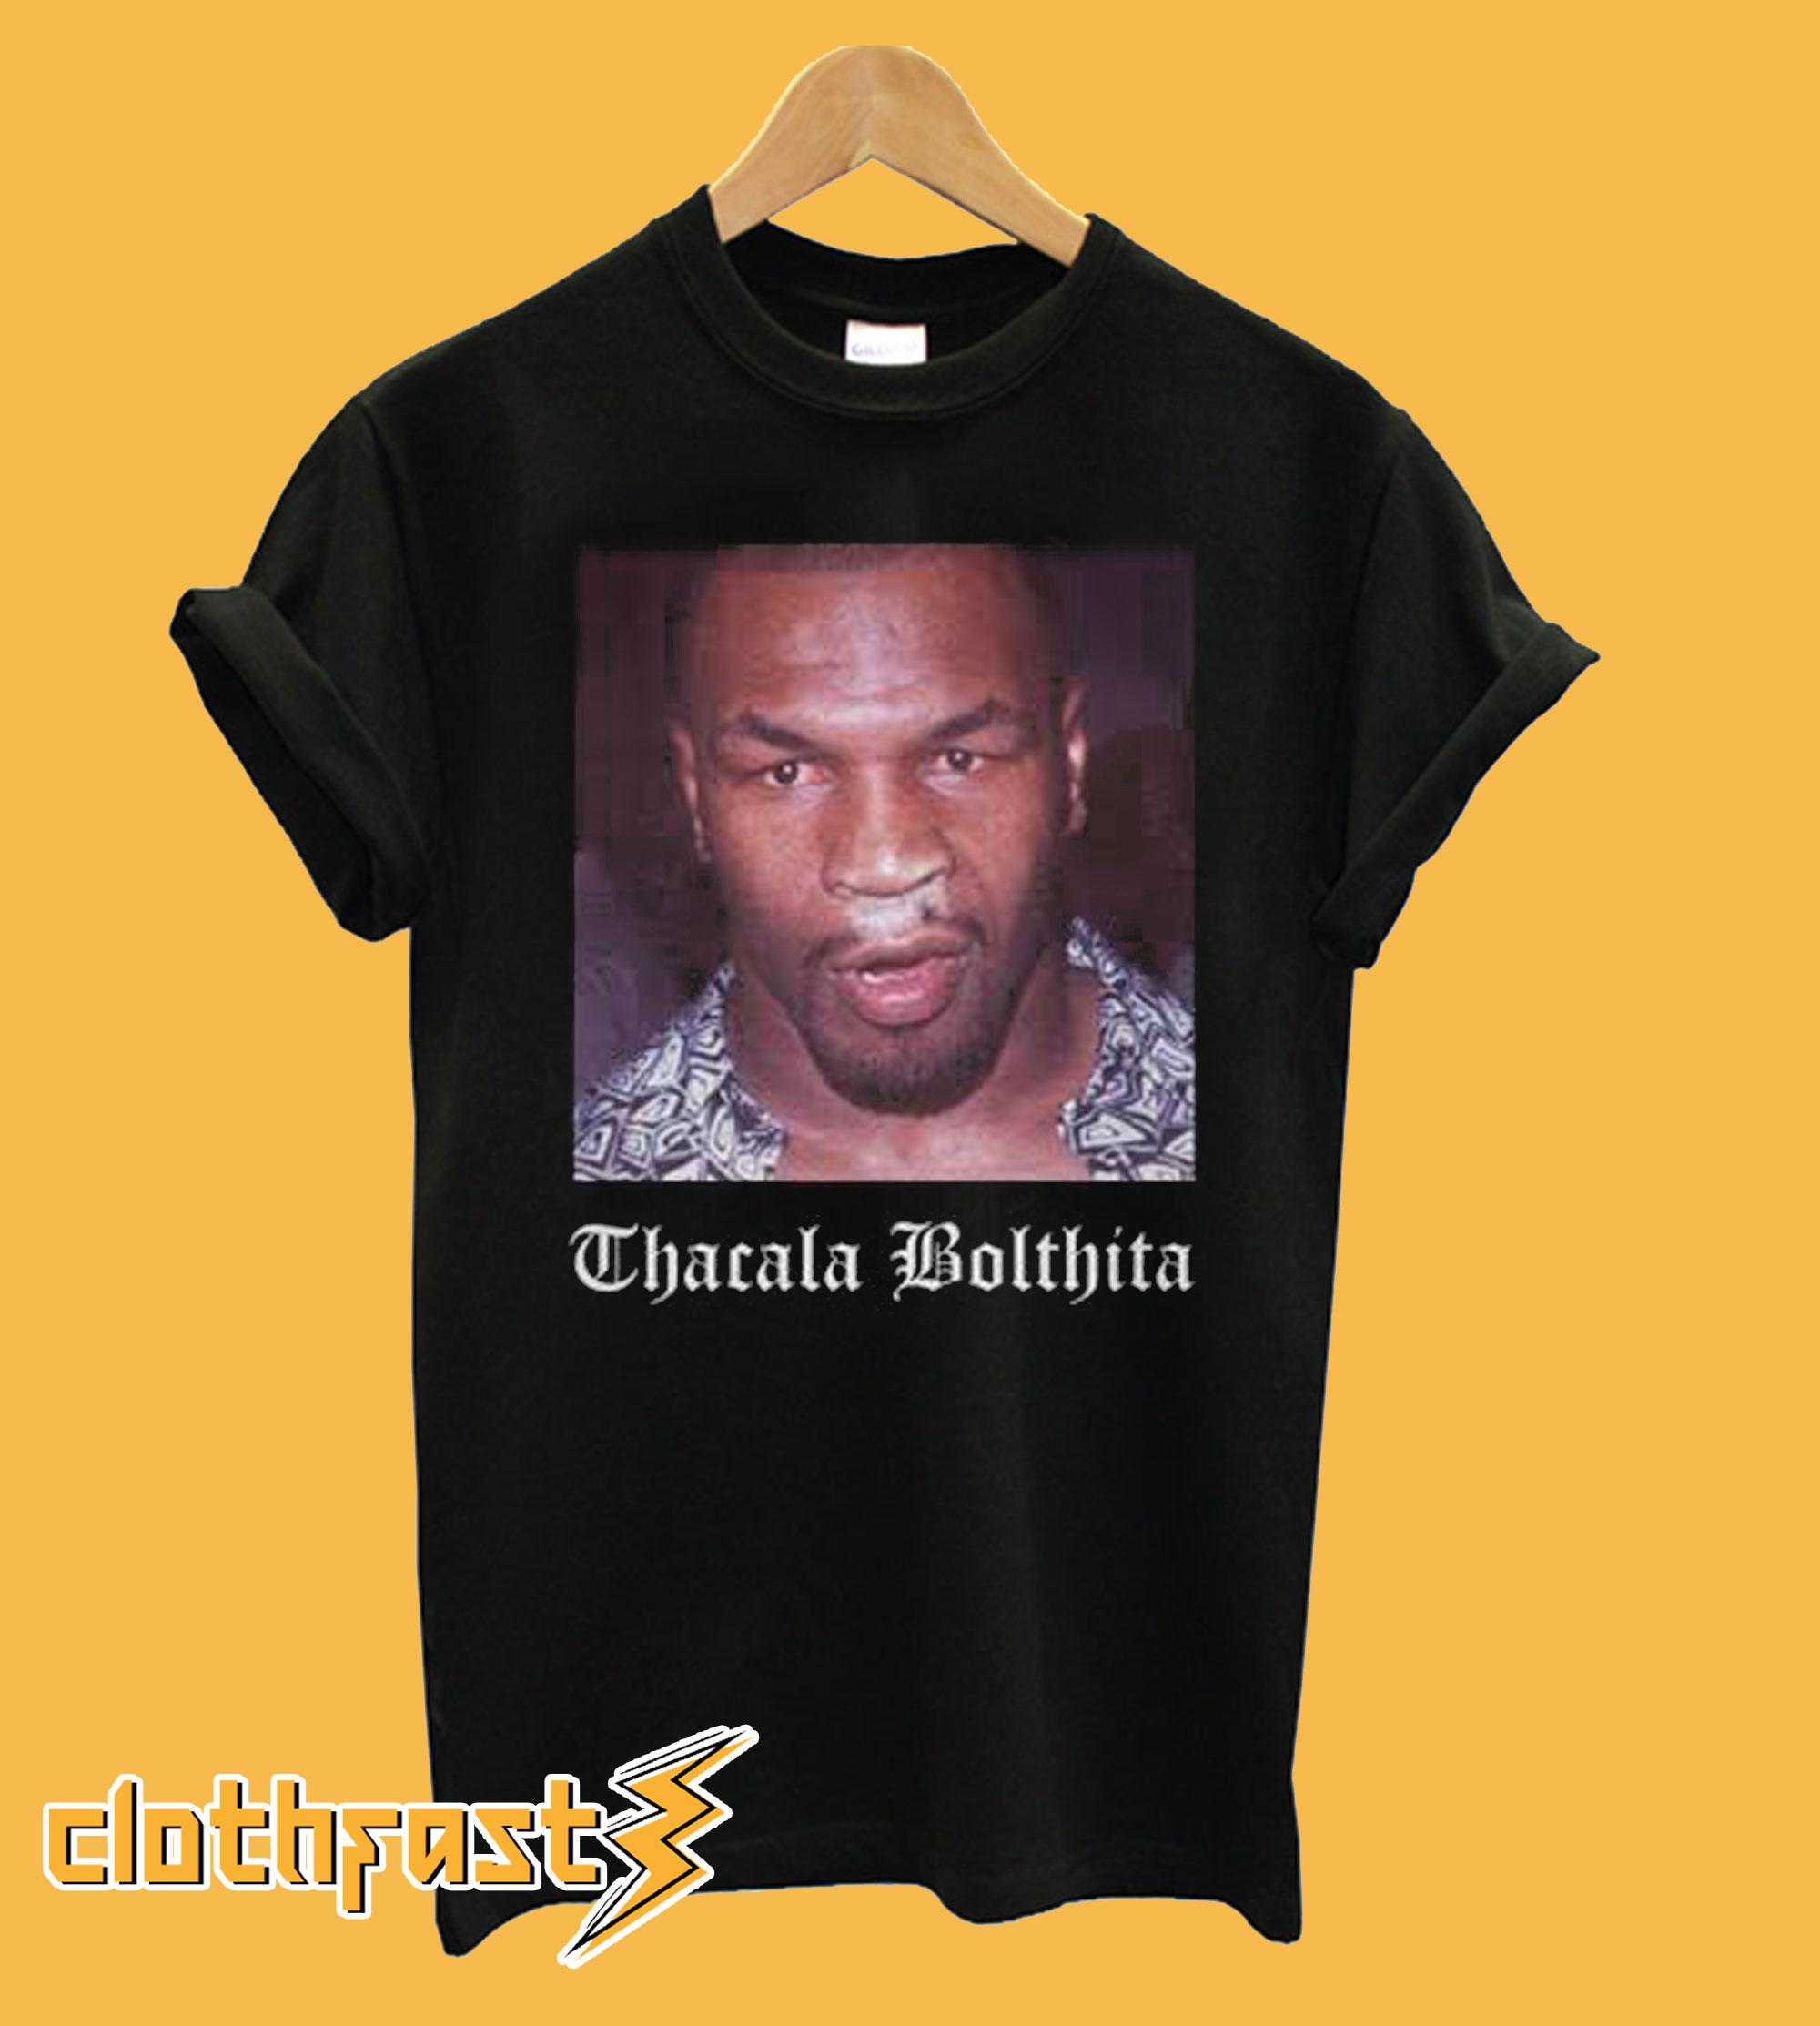 Mike tyson thacala bolthita T shirt